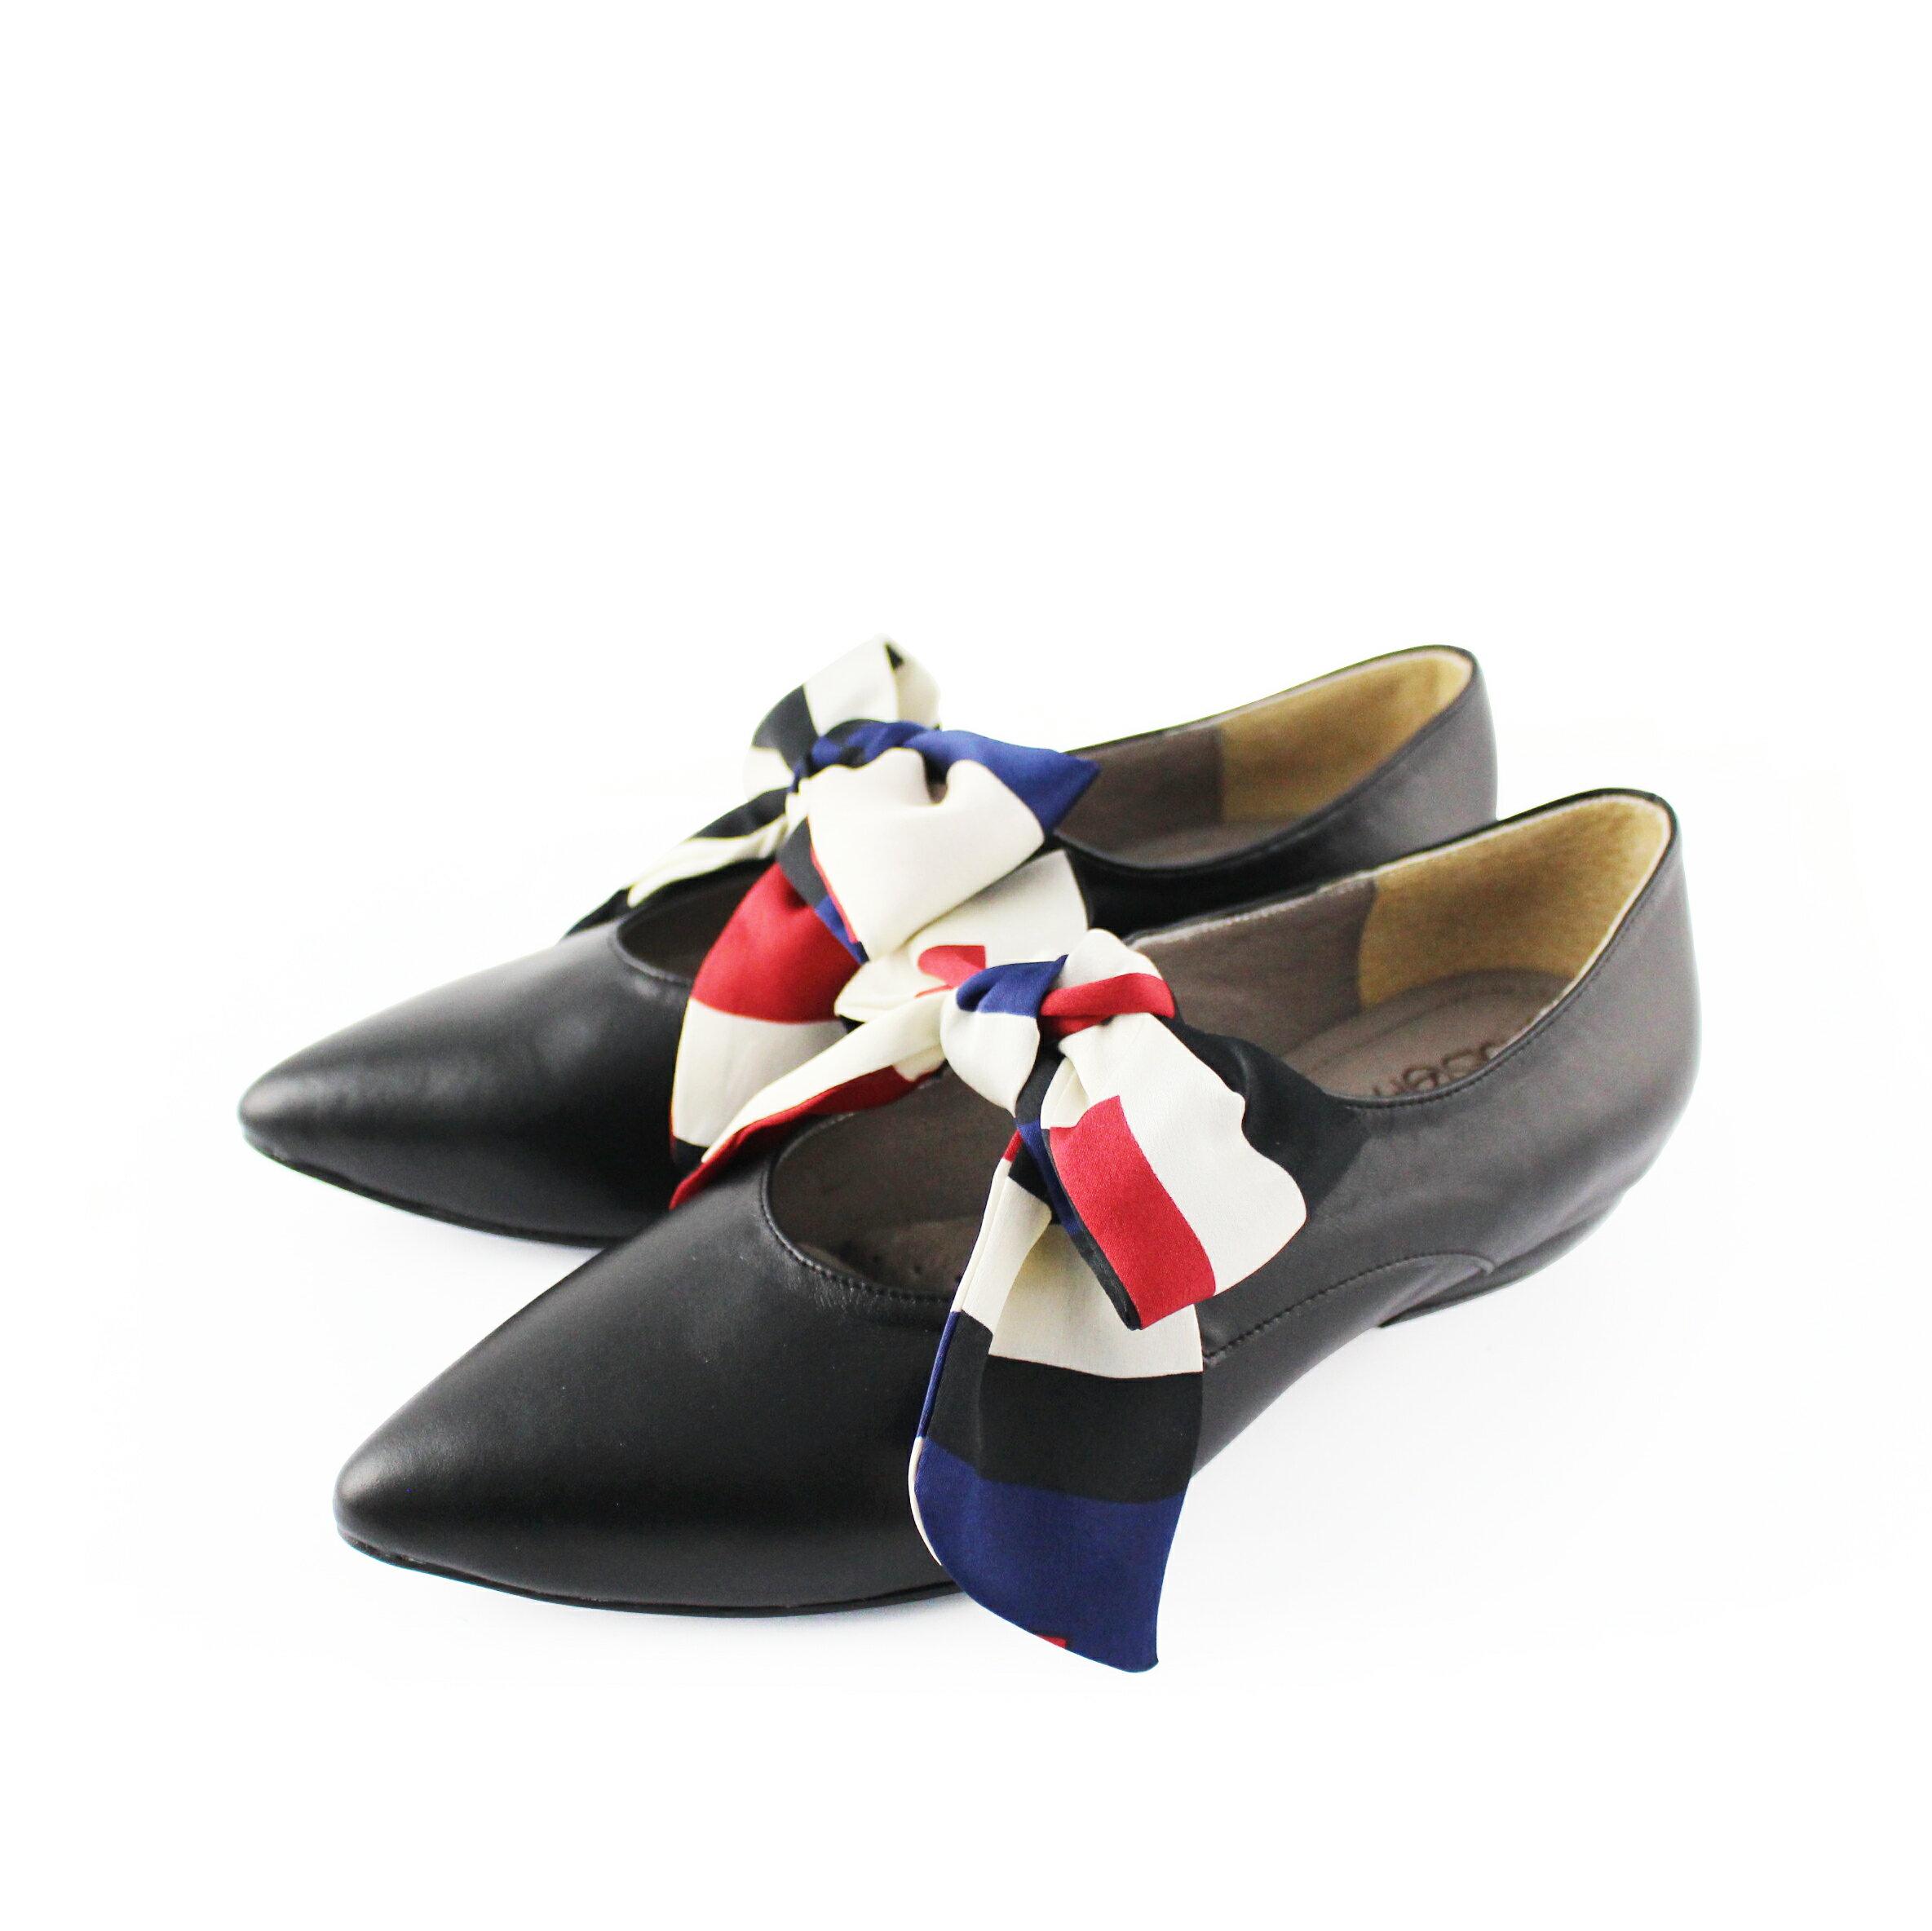 【F2-19104L】優雅緞布蝴蝶結低跟鞋_Shoes Party 4